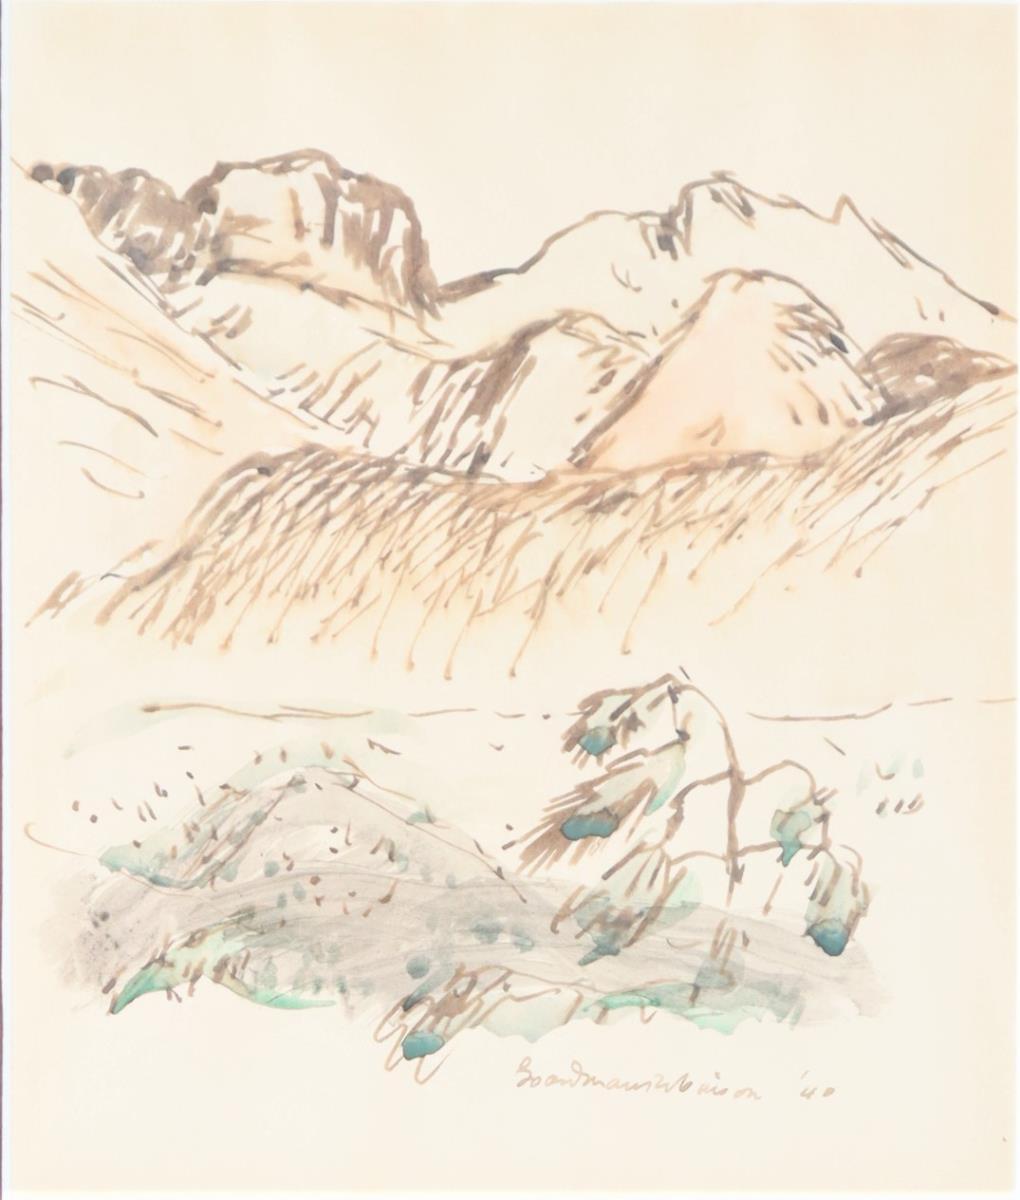 Boardman Robinson (1876-1952) American, W/C - Image 3 of 4